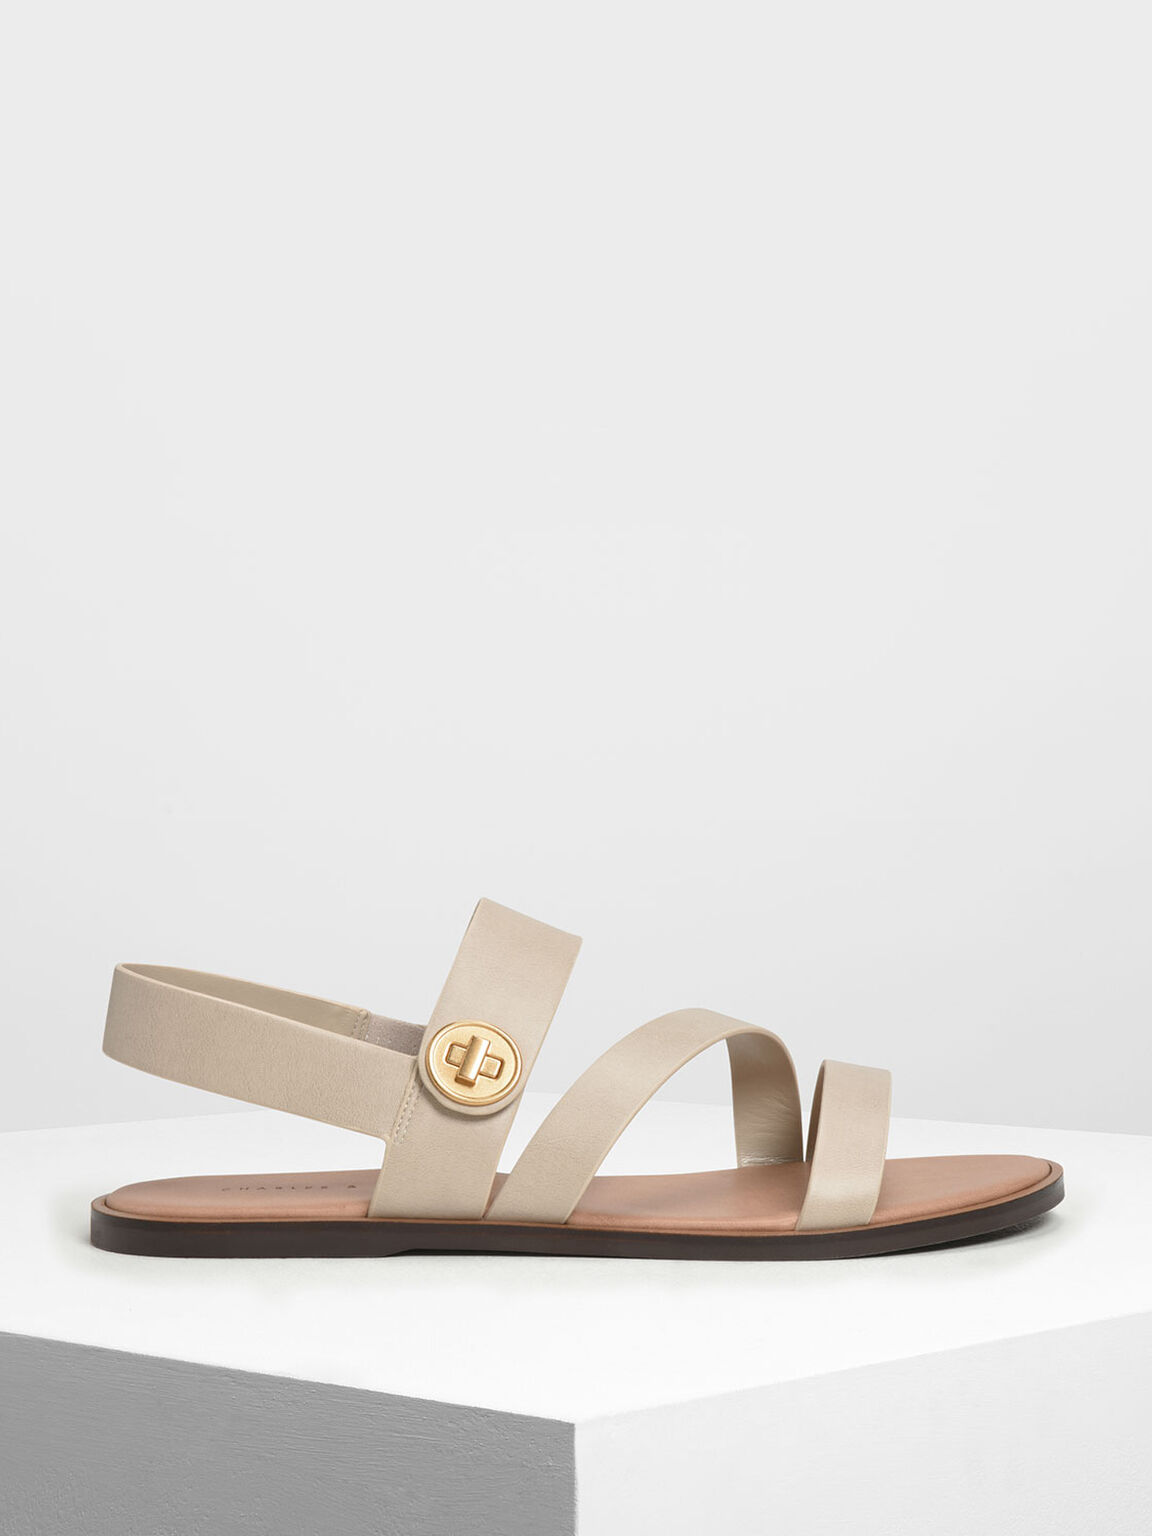 Asymmetrical Strappy Sandals, Chalk, hi-res